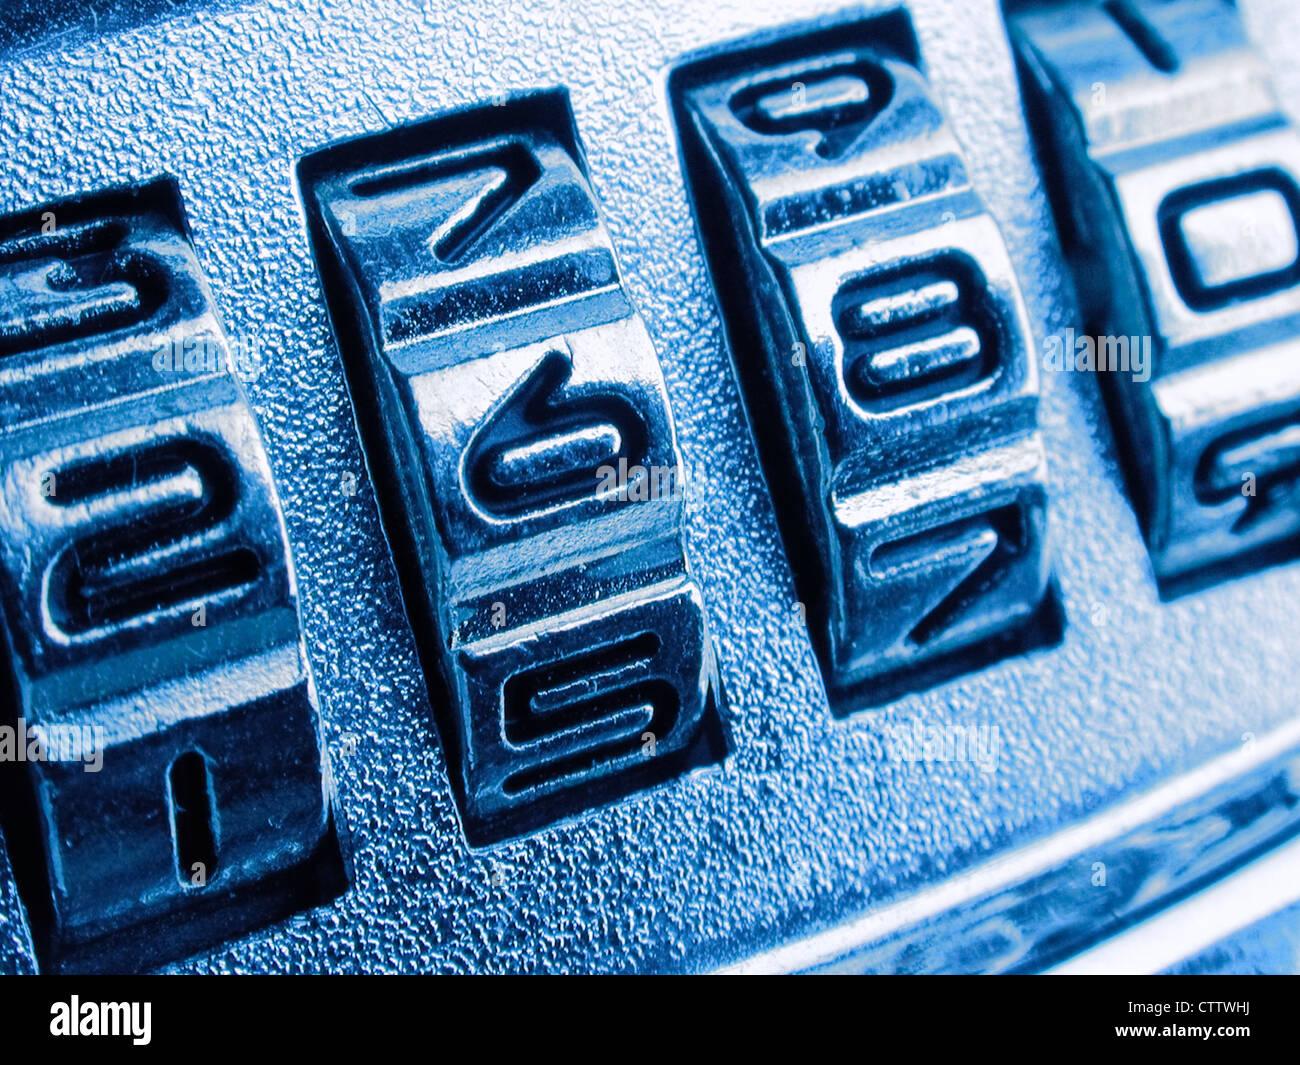 Zahlenräder an einem Zahlenschloss - Stock Image